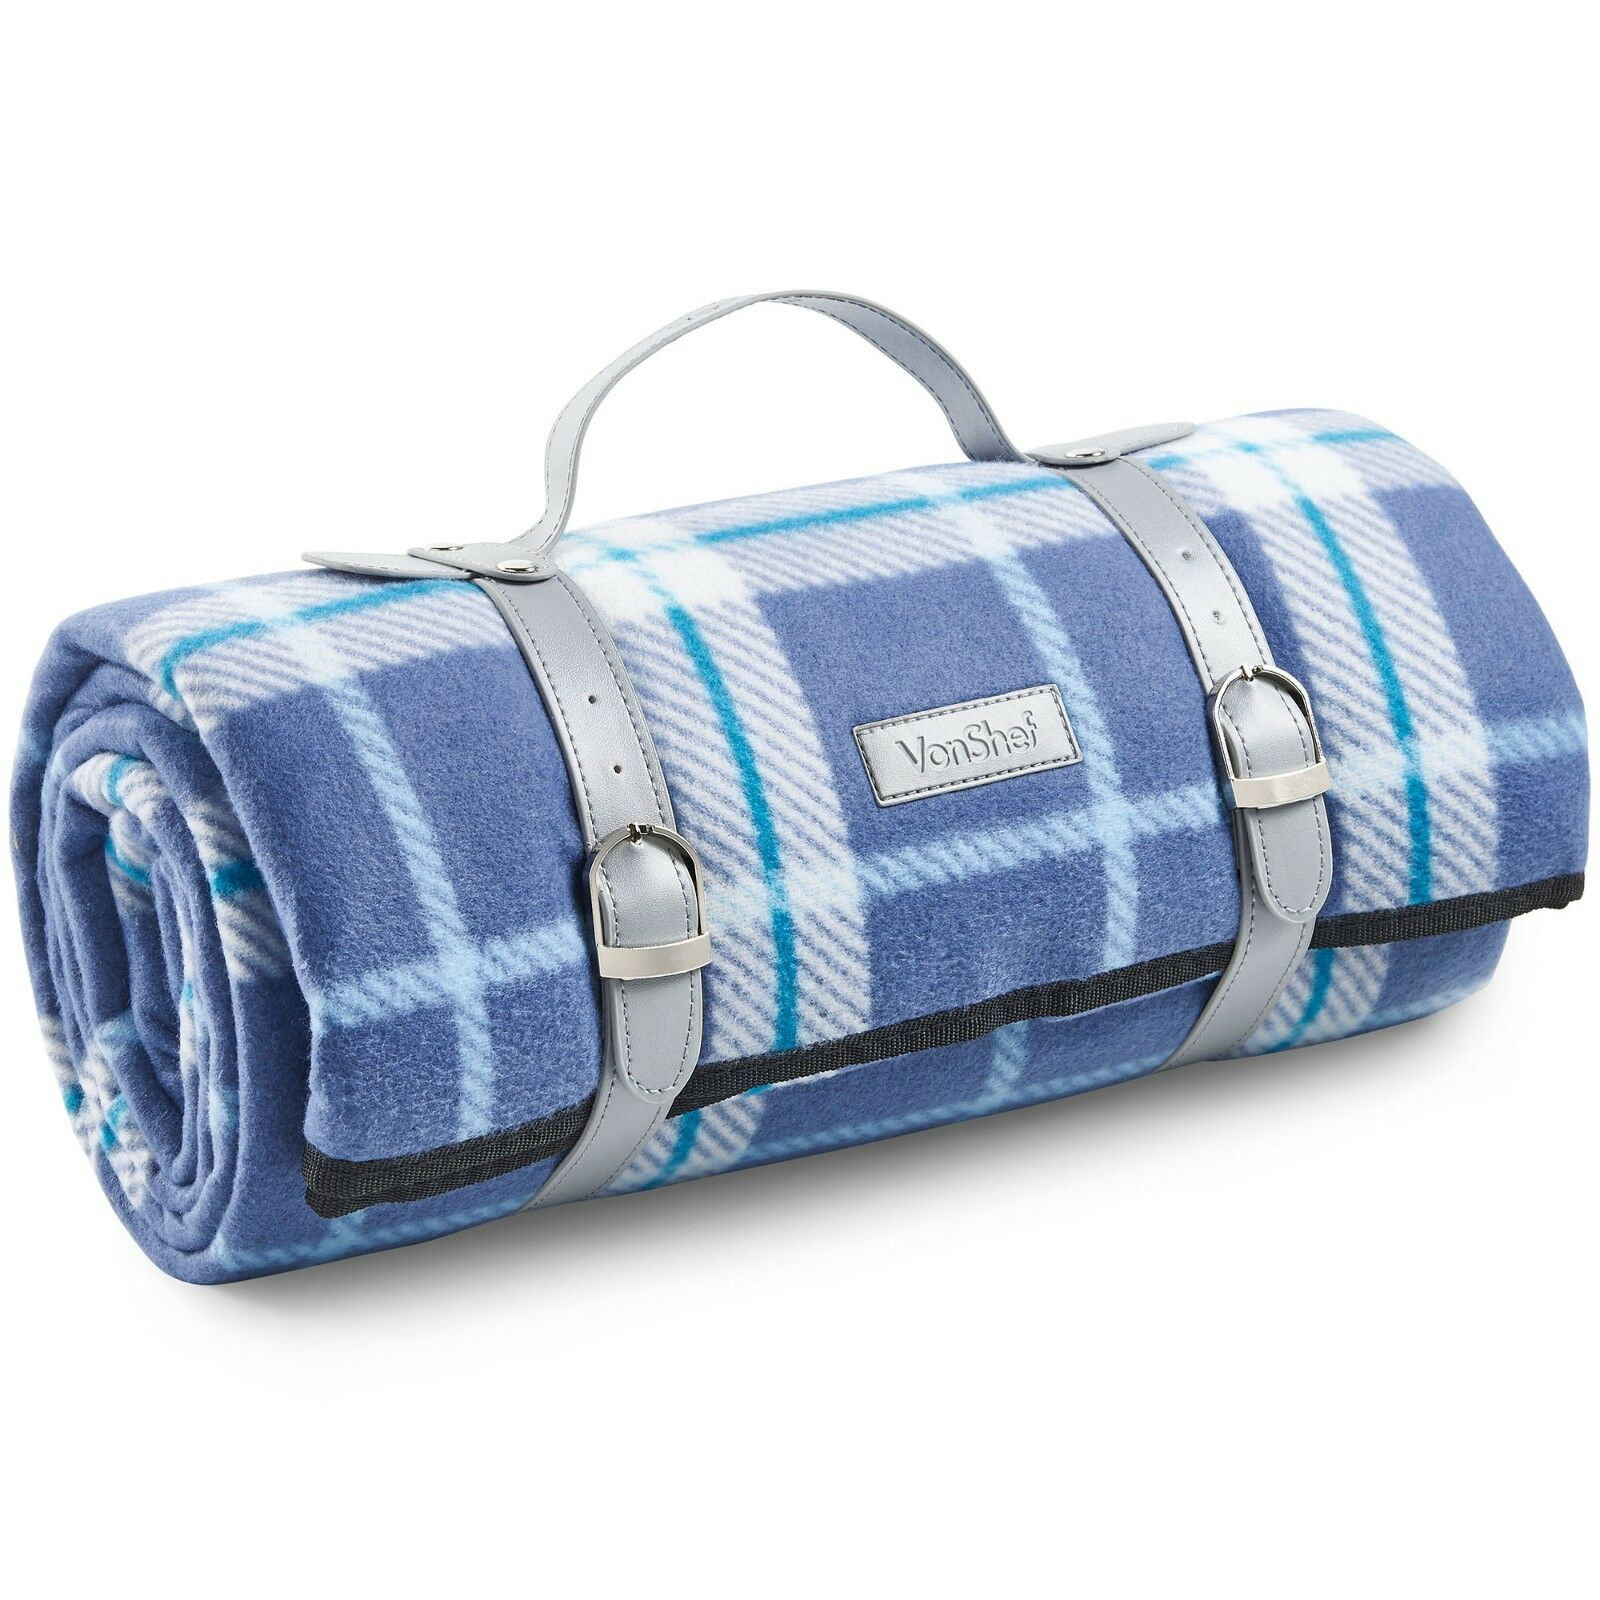 picnic blanket mat waterproof for outdoor picnics